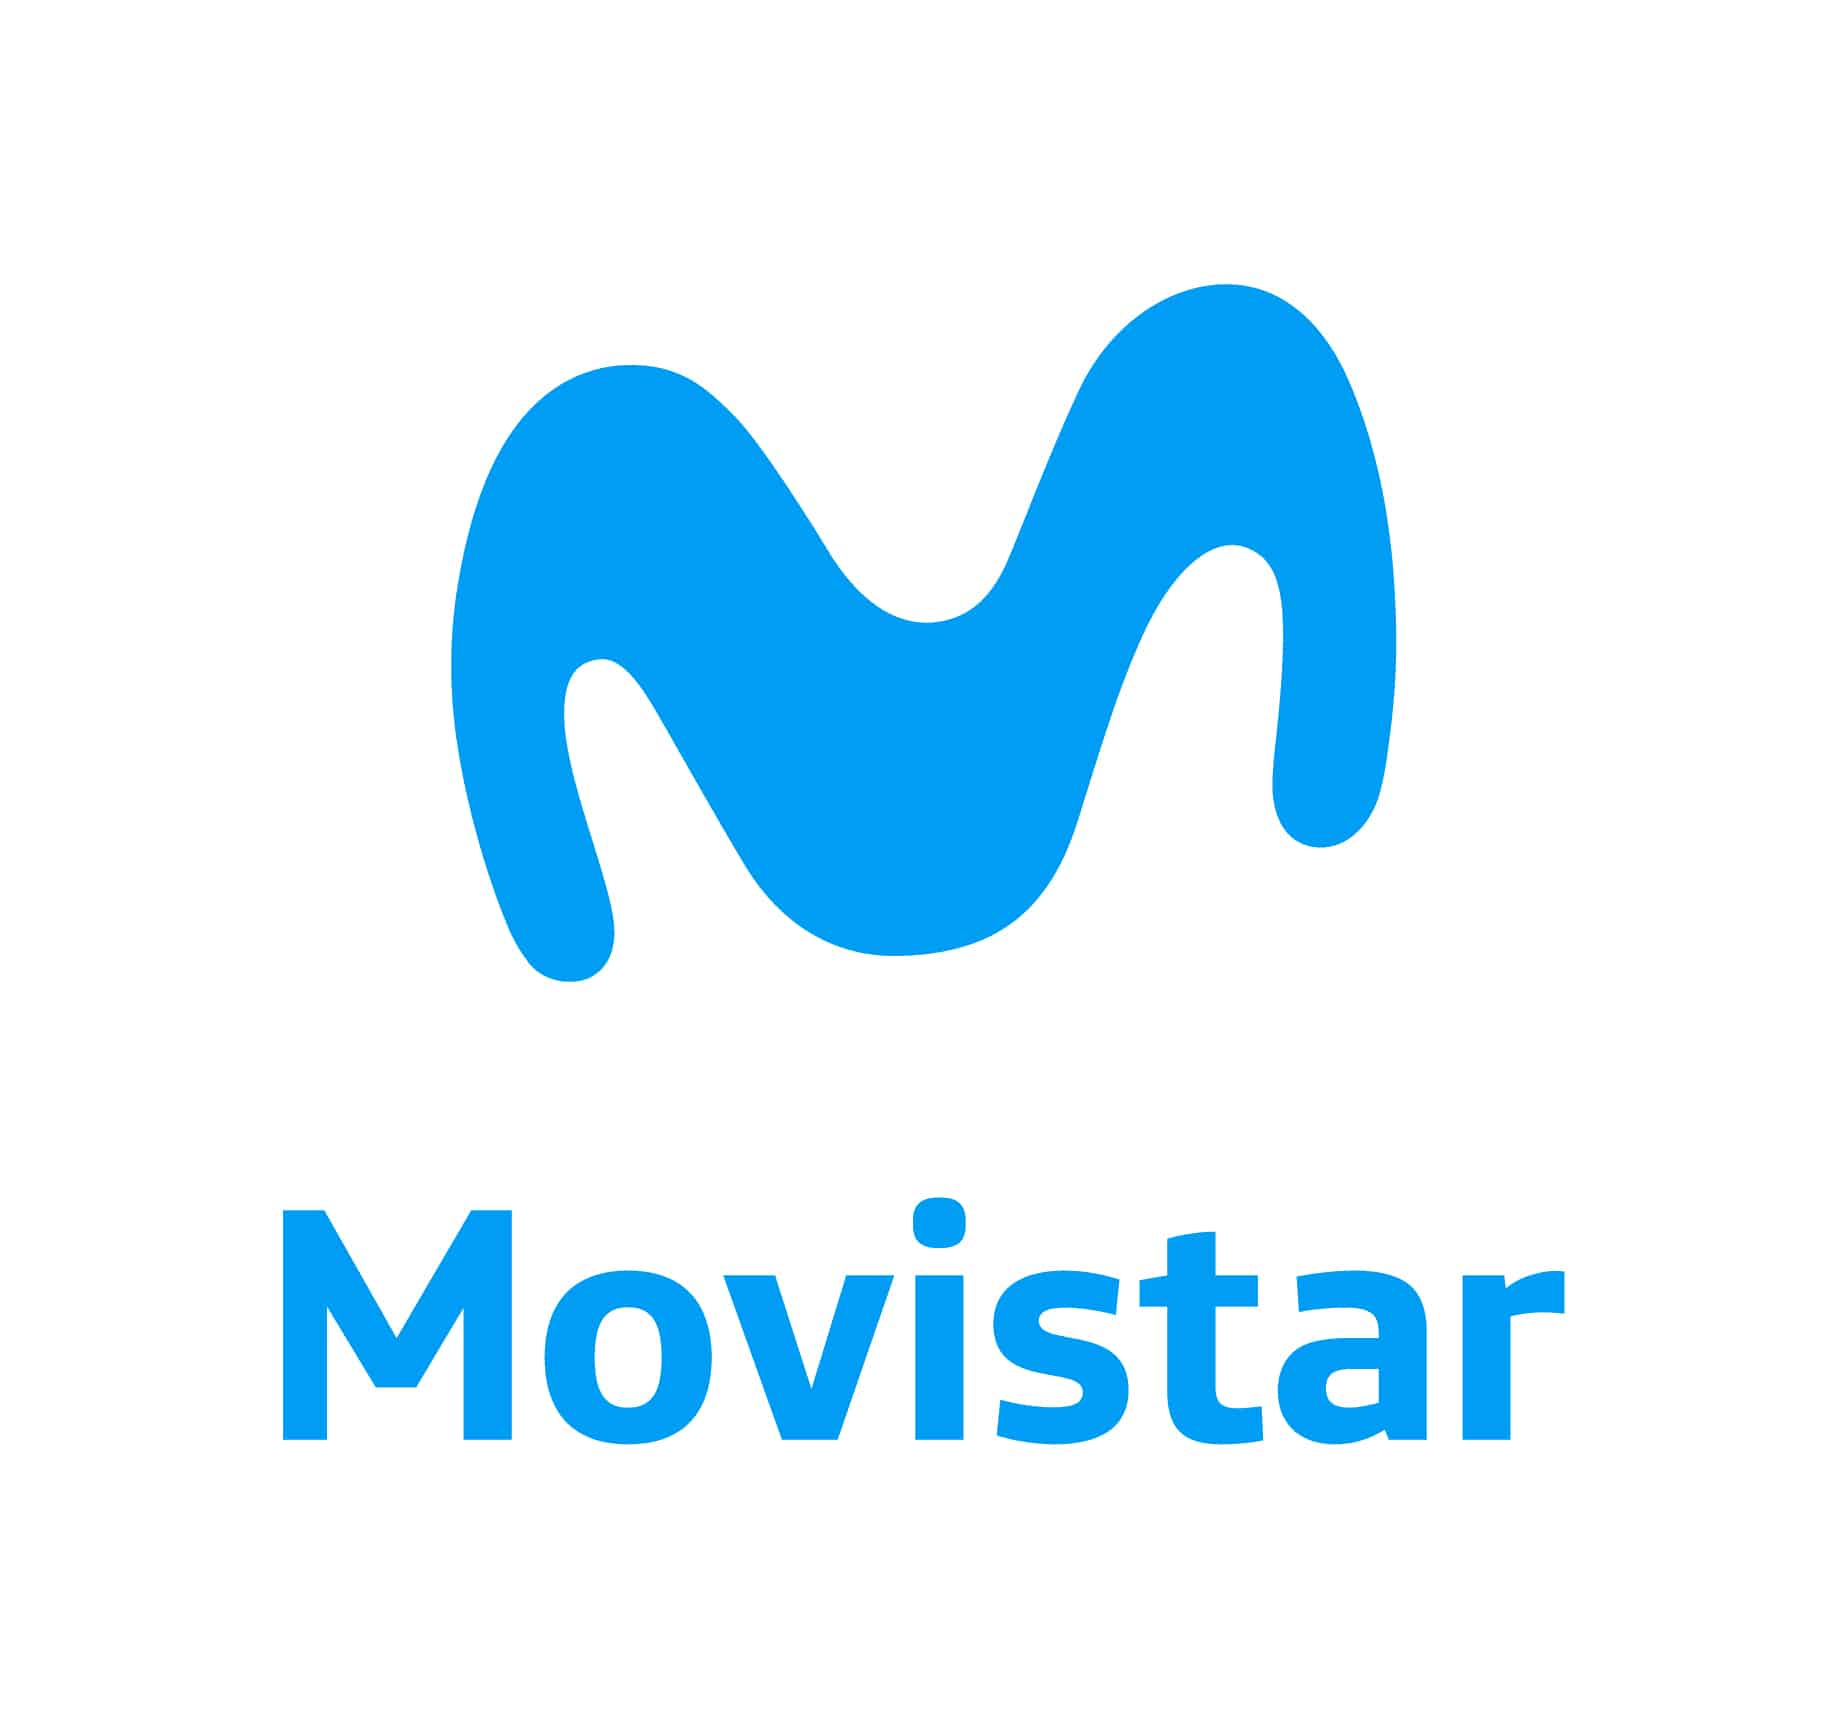 Movistar testdisconline